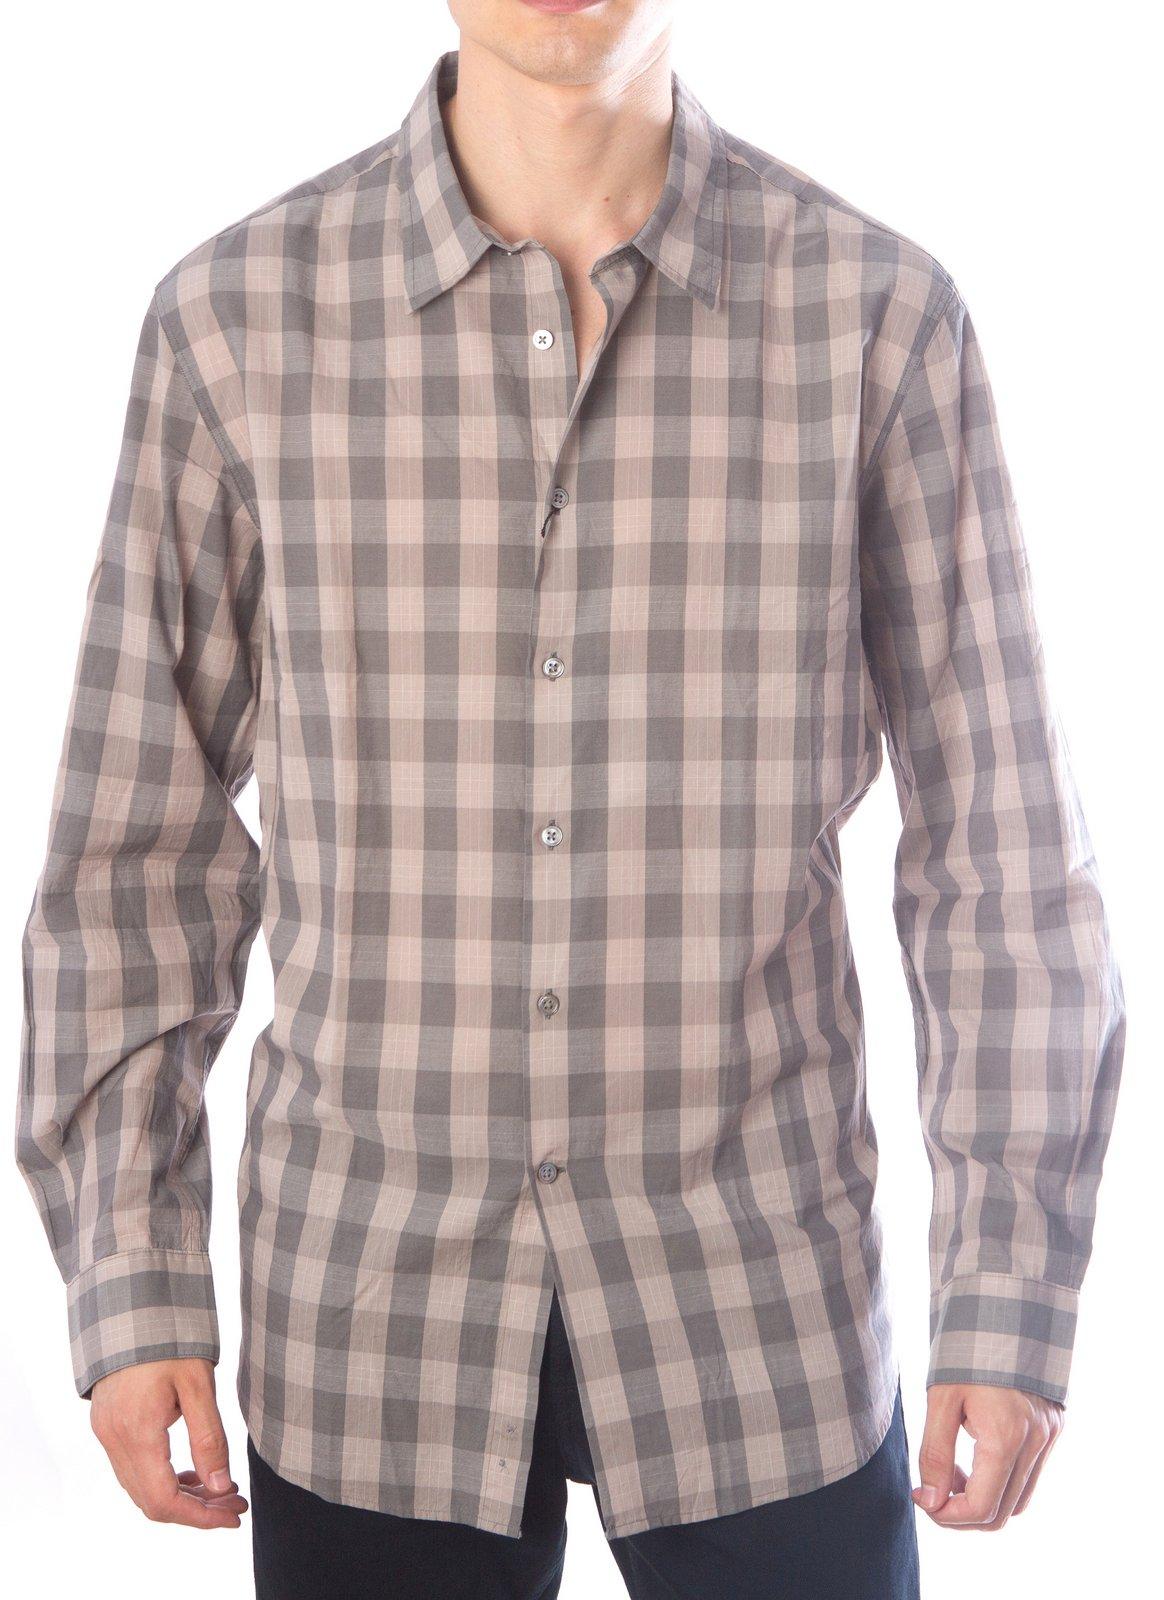 John Varvatos Mens Casual Shirt Multicolor Sz XL W276J2-26MC at Sears.com